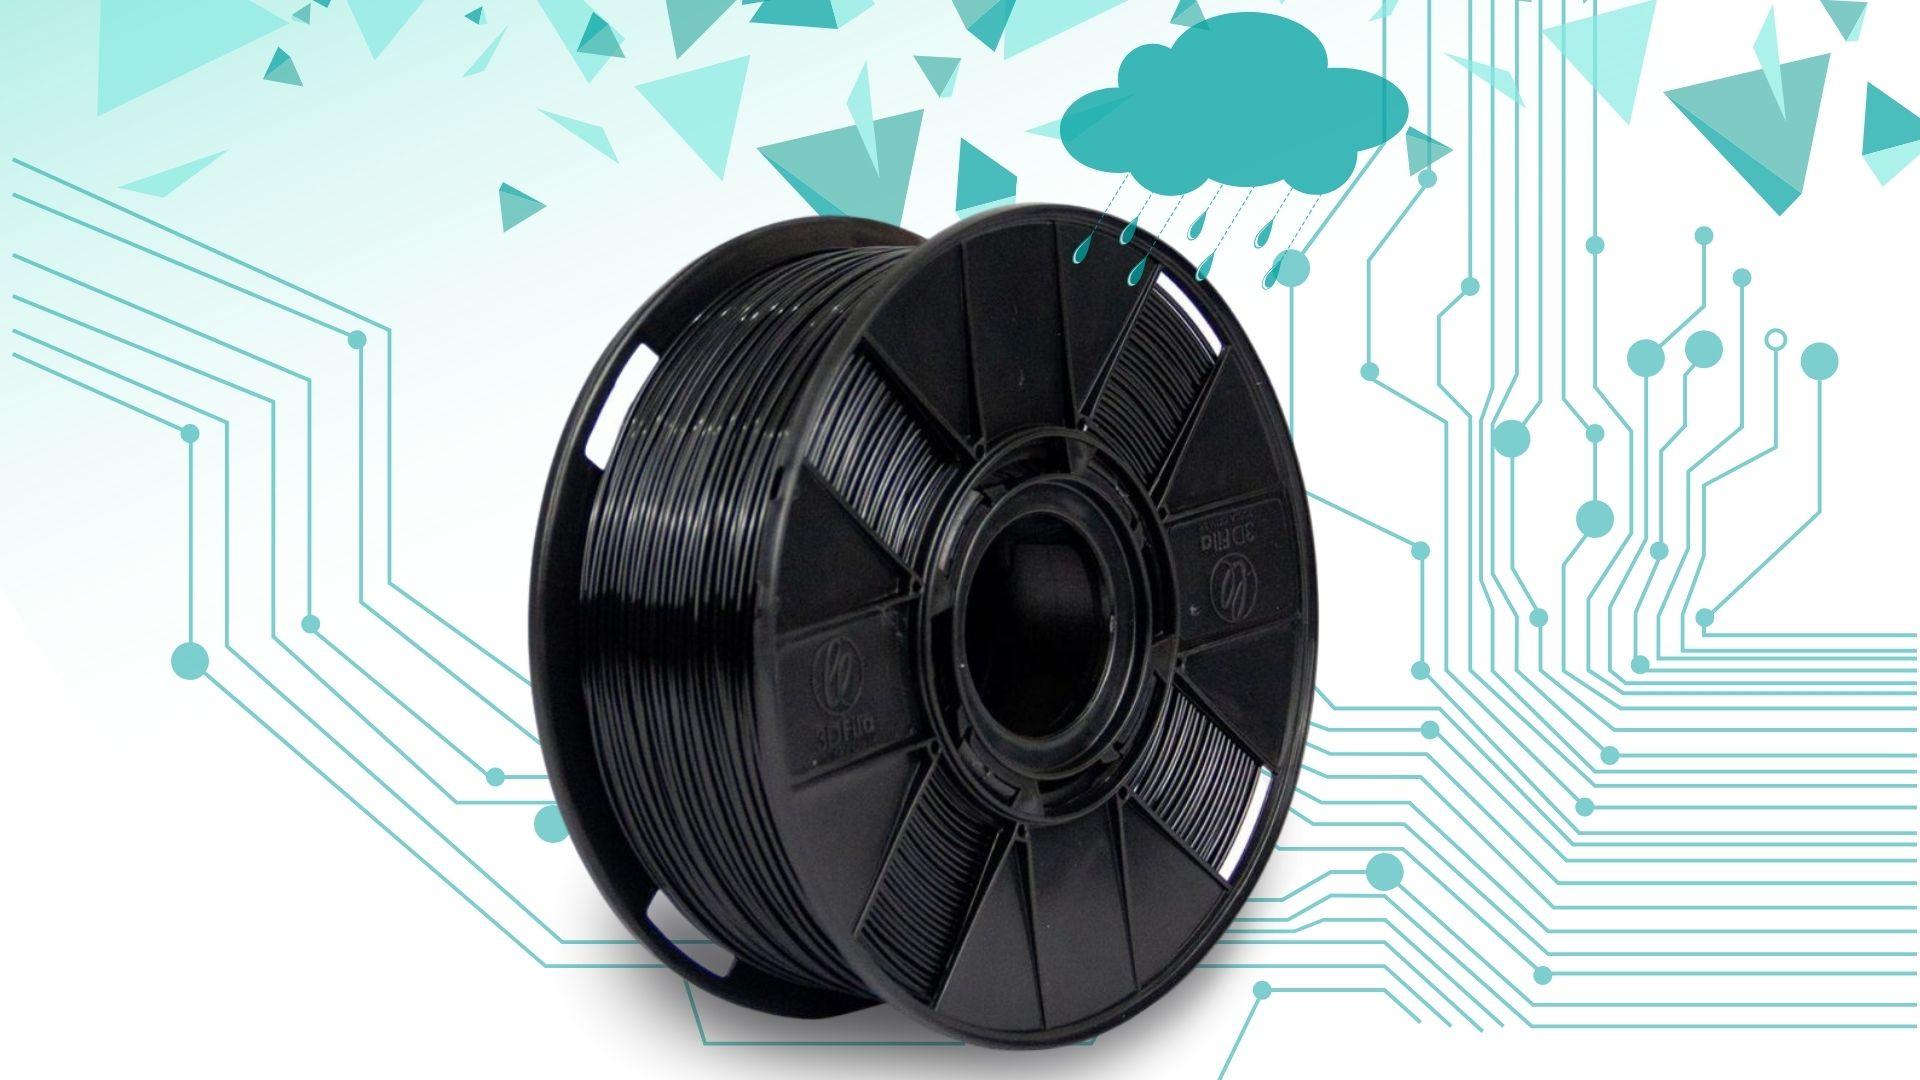 Foto de capa referente ao filamento ASA WP